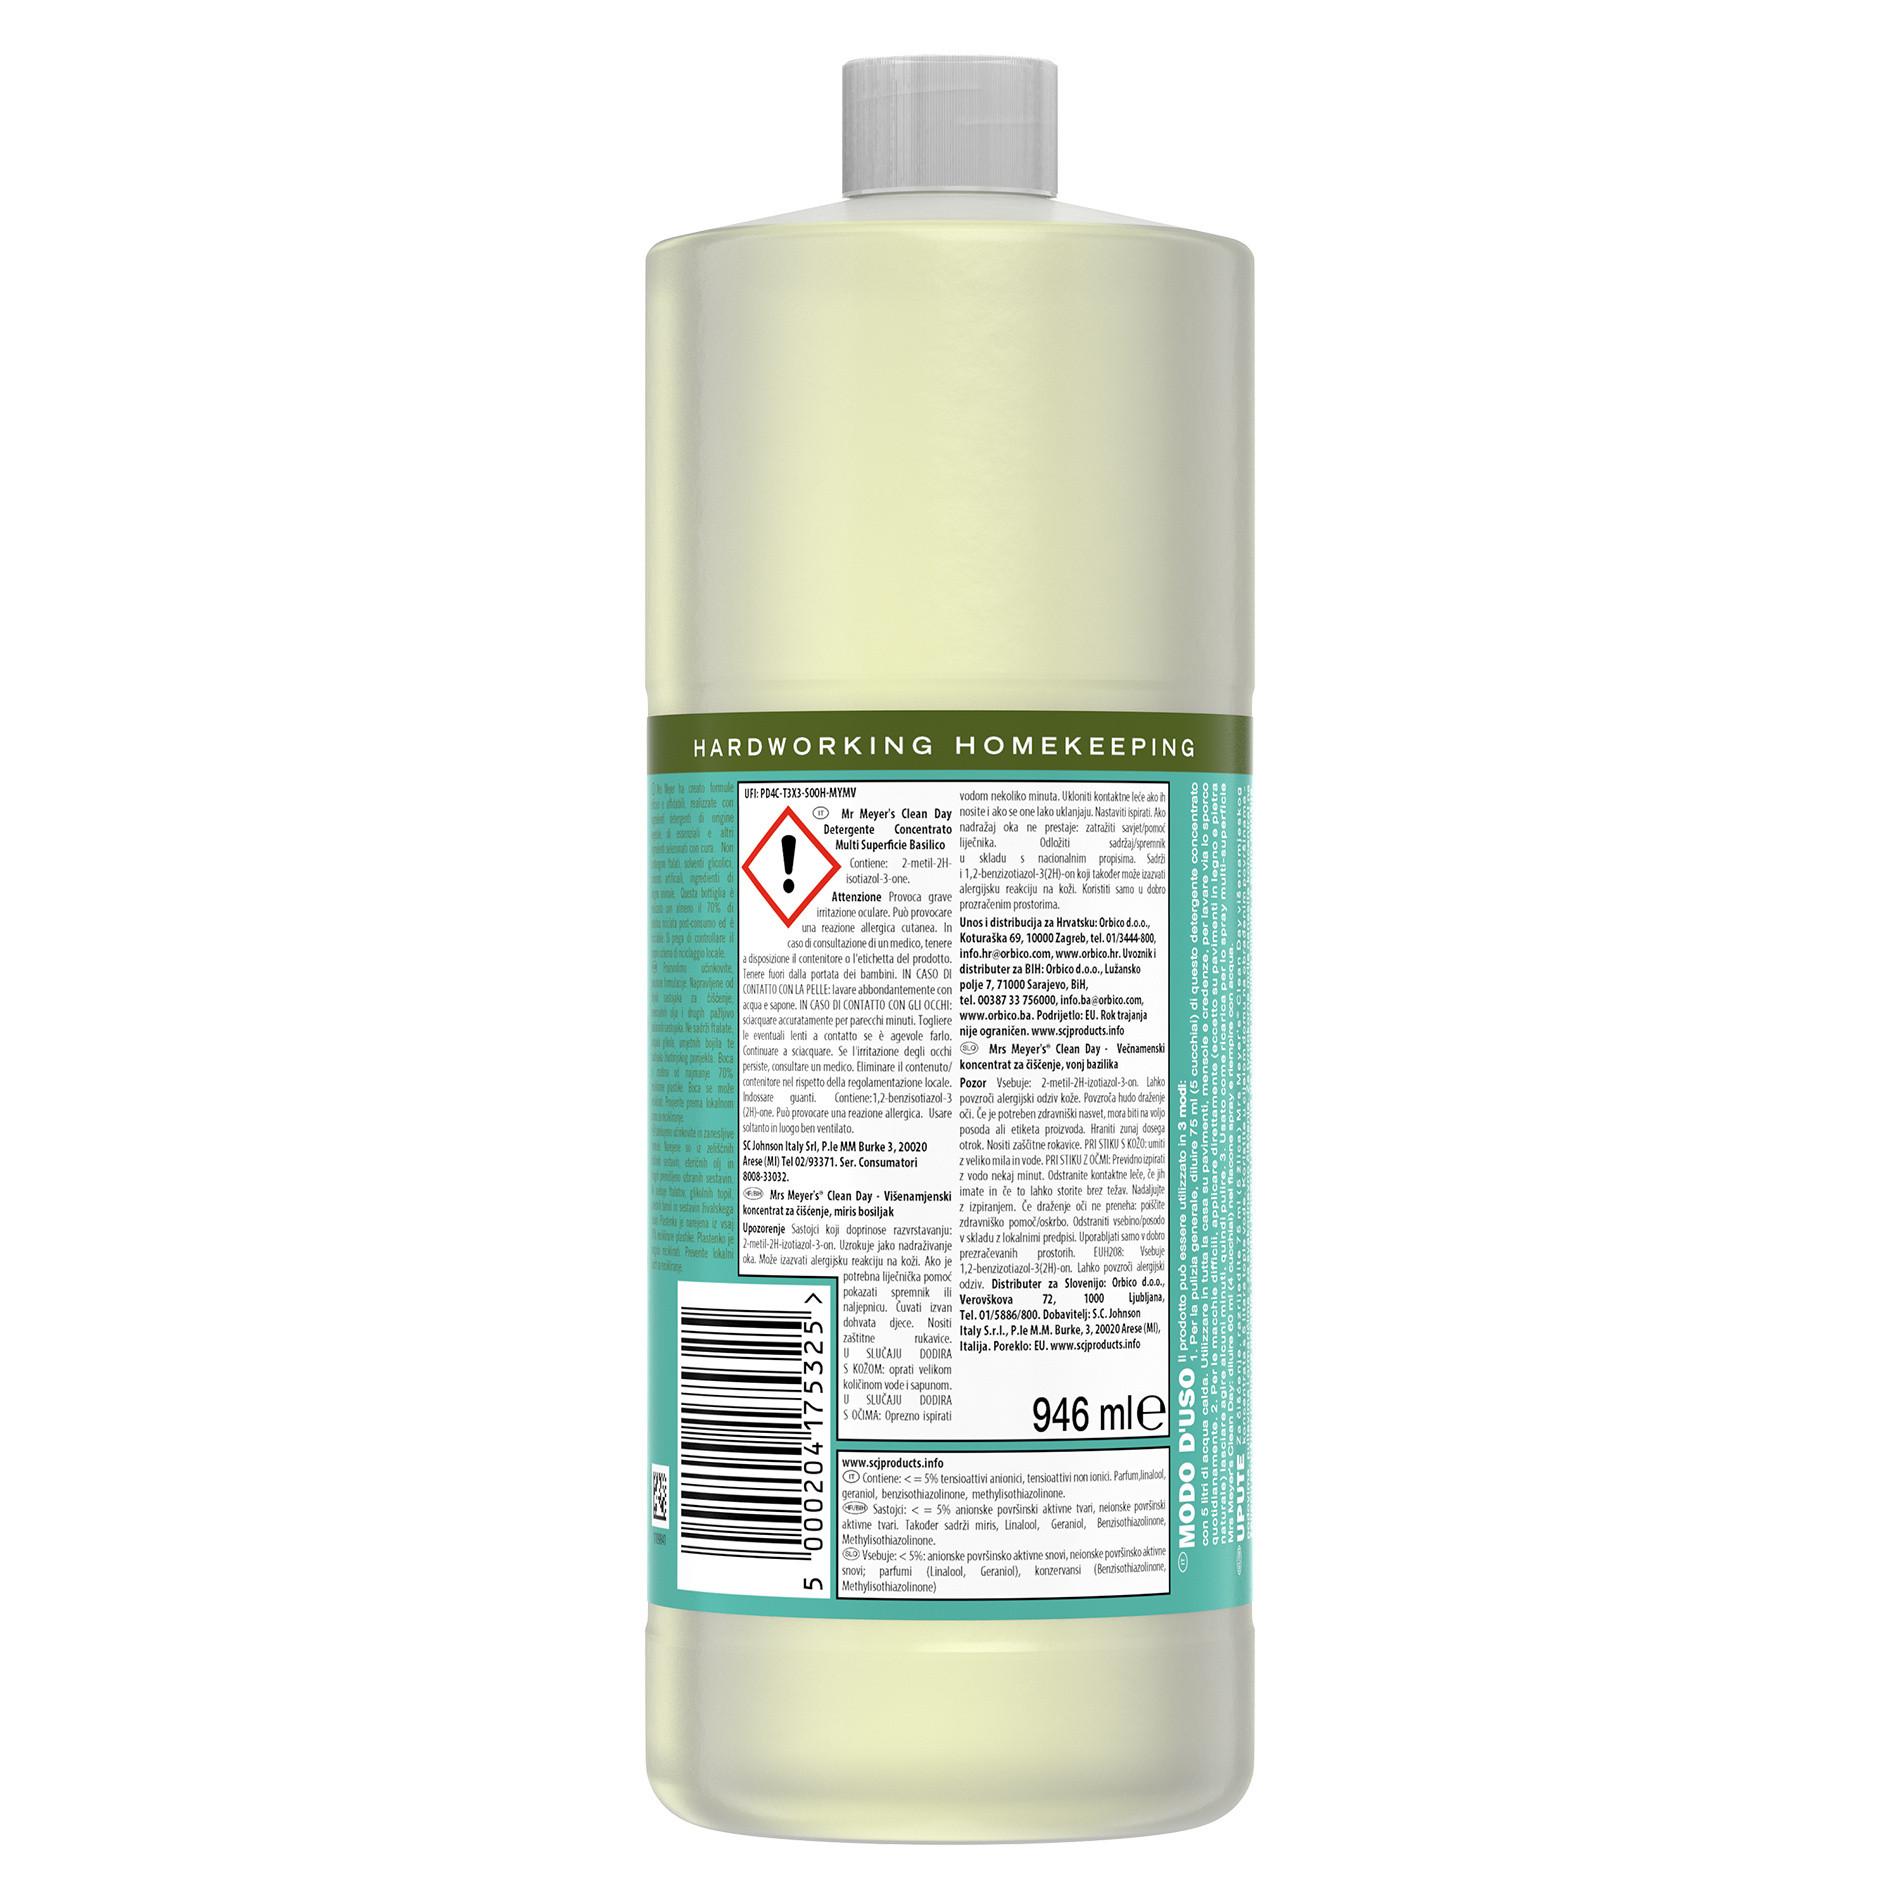 Detergente concentrato multi-supericie profumo di basilico 946ml, Verde smeraldo, large image number 1